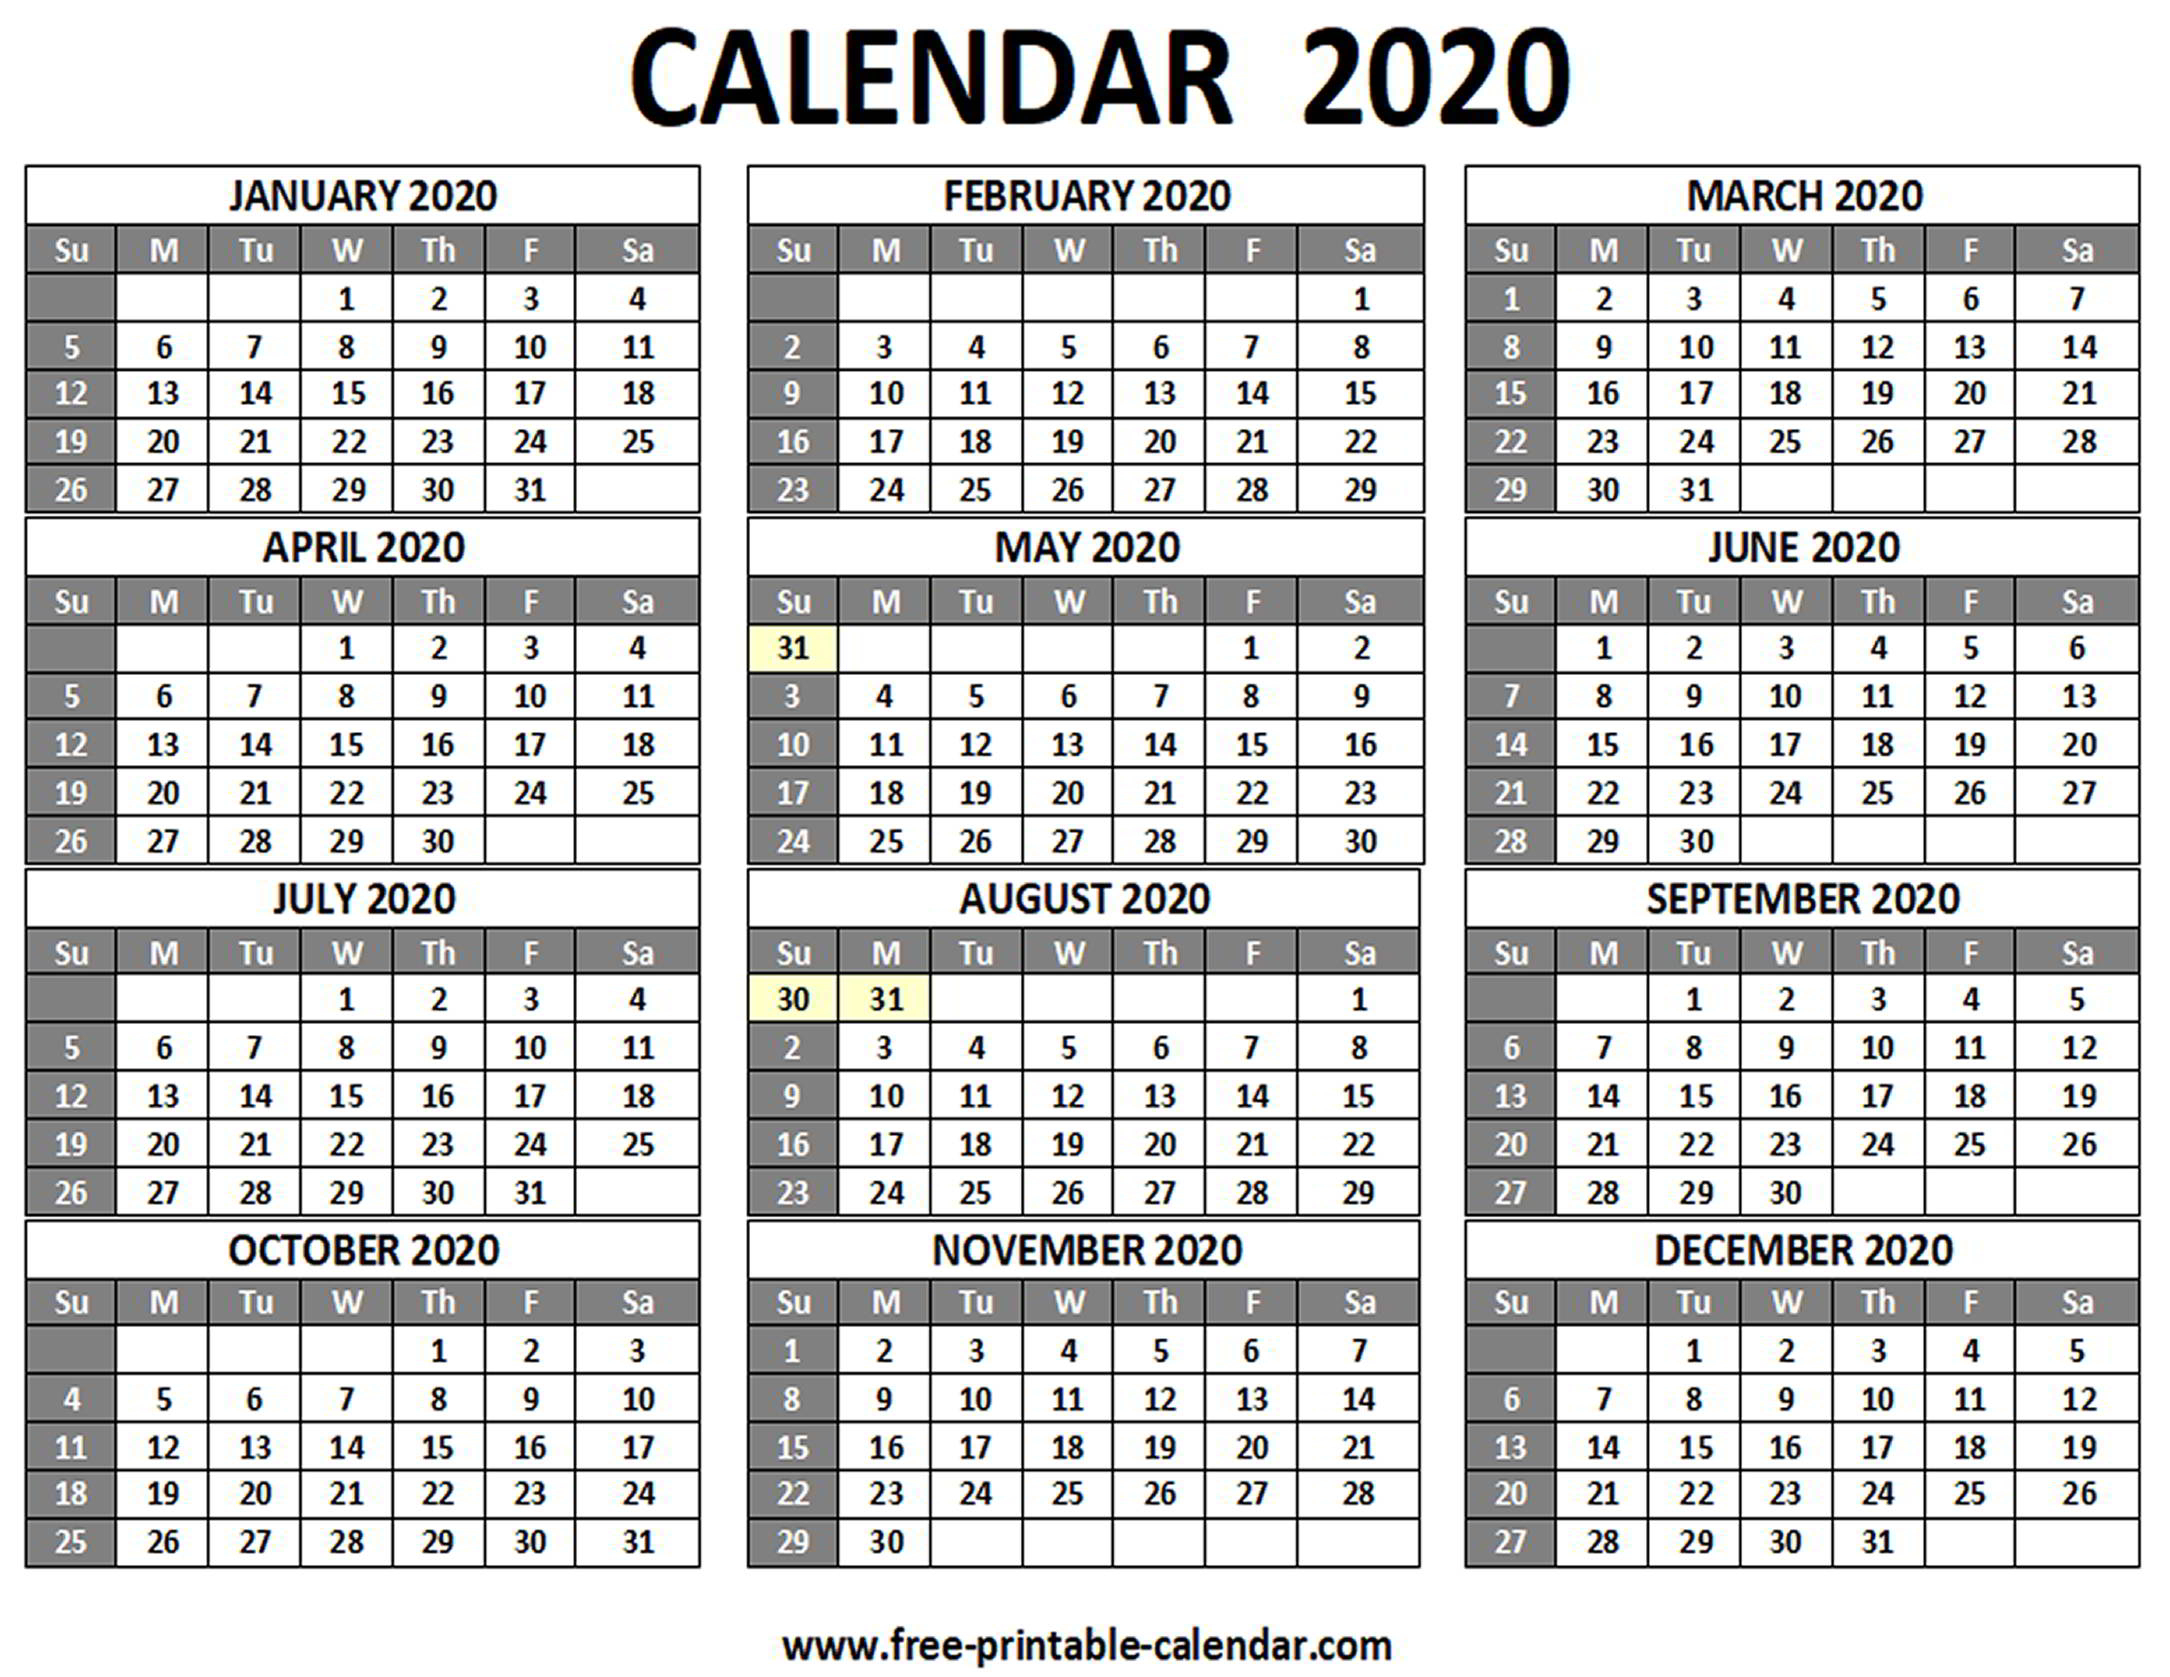 Printable 2020 Calendar - Free-Printable-Calendar within 2020 Calendars That You Can Edit